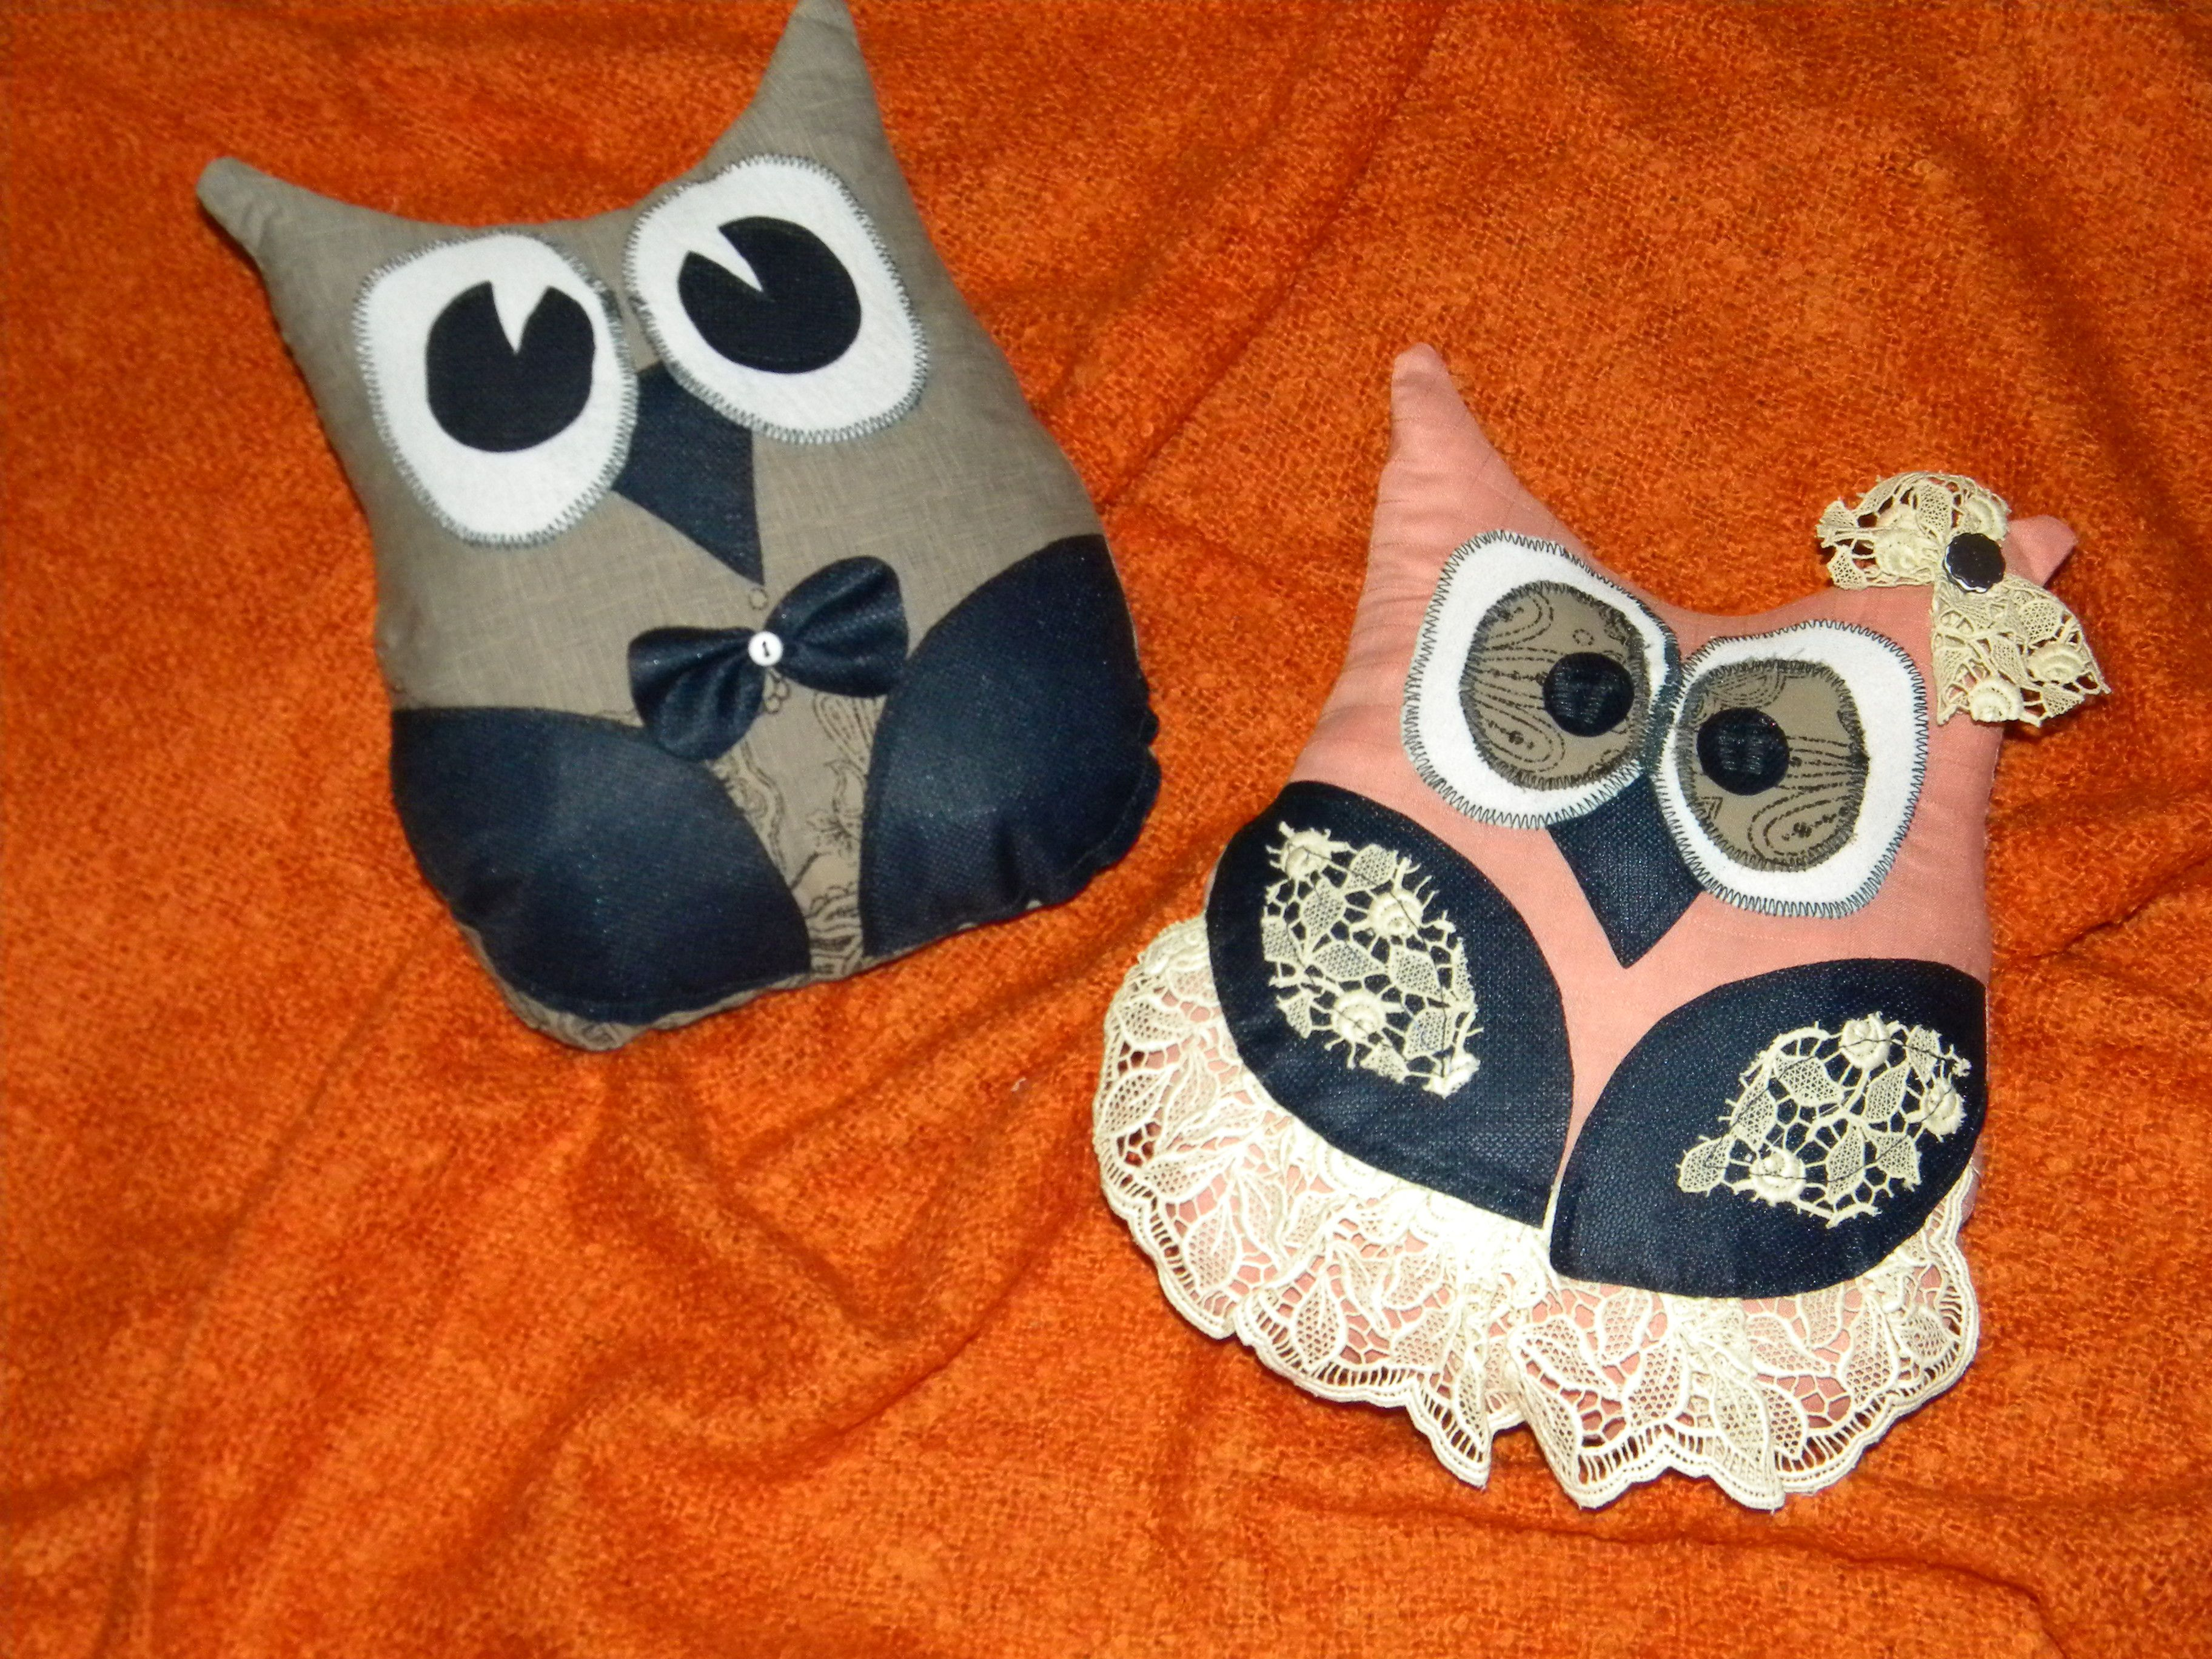 подушка игрушки подарок синтепон декор мягкие интерьер сова